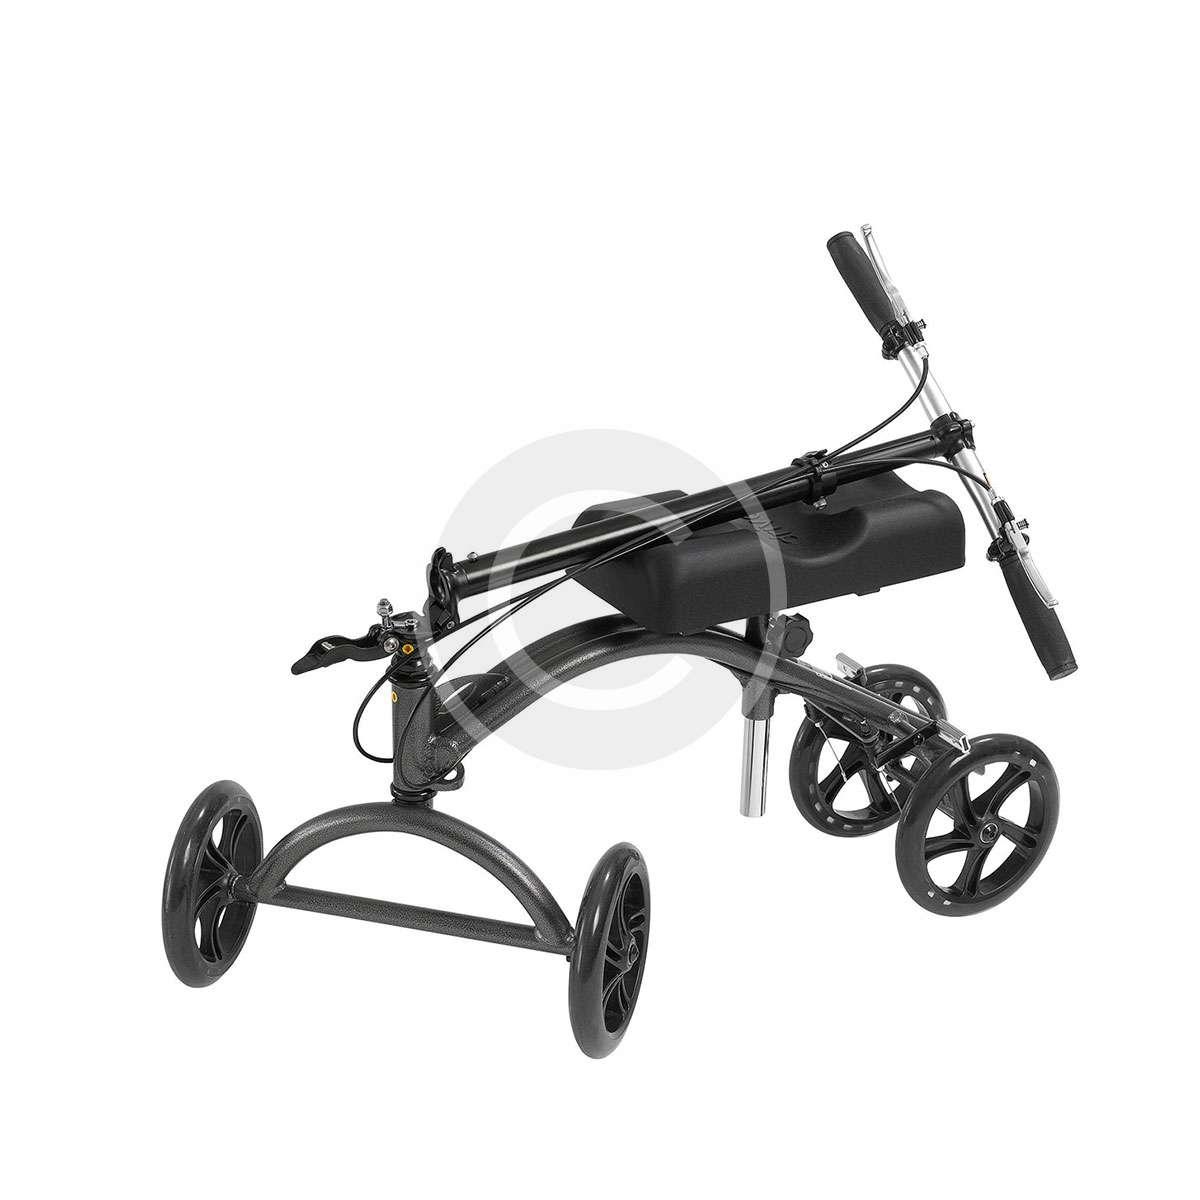 Bariatric Heavy Duty Trapeze Bar with Wheels